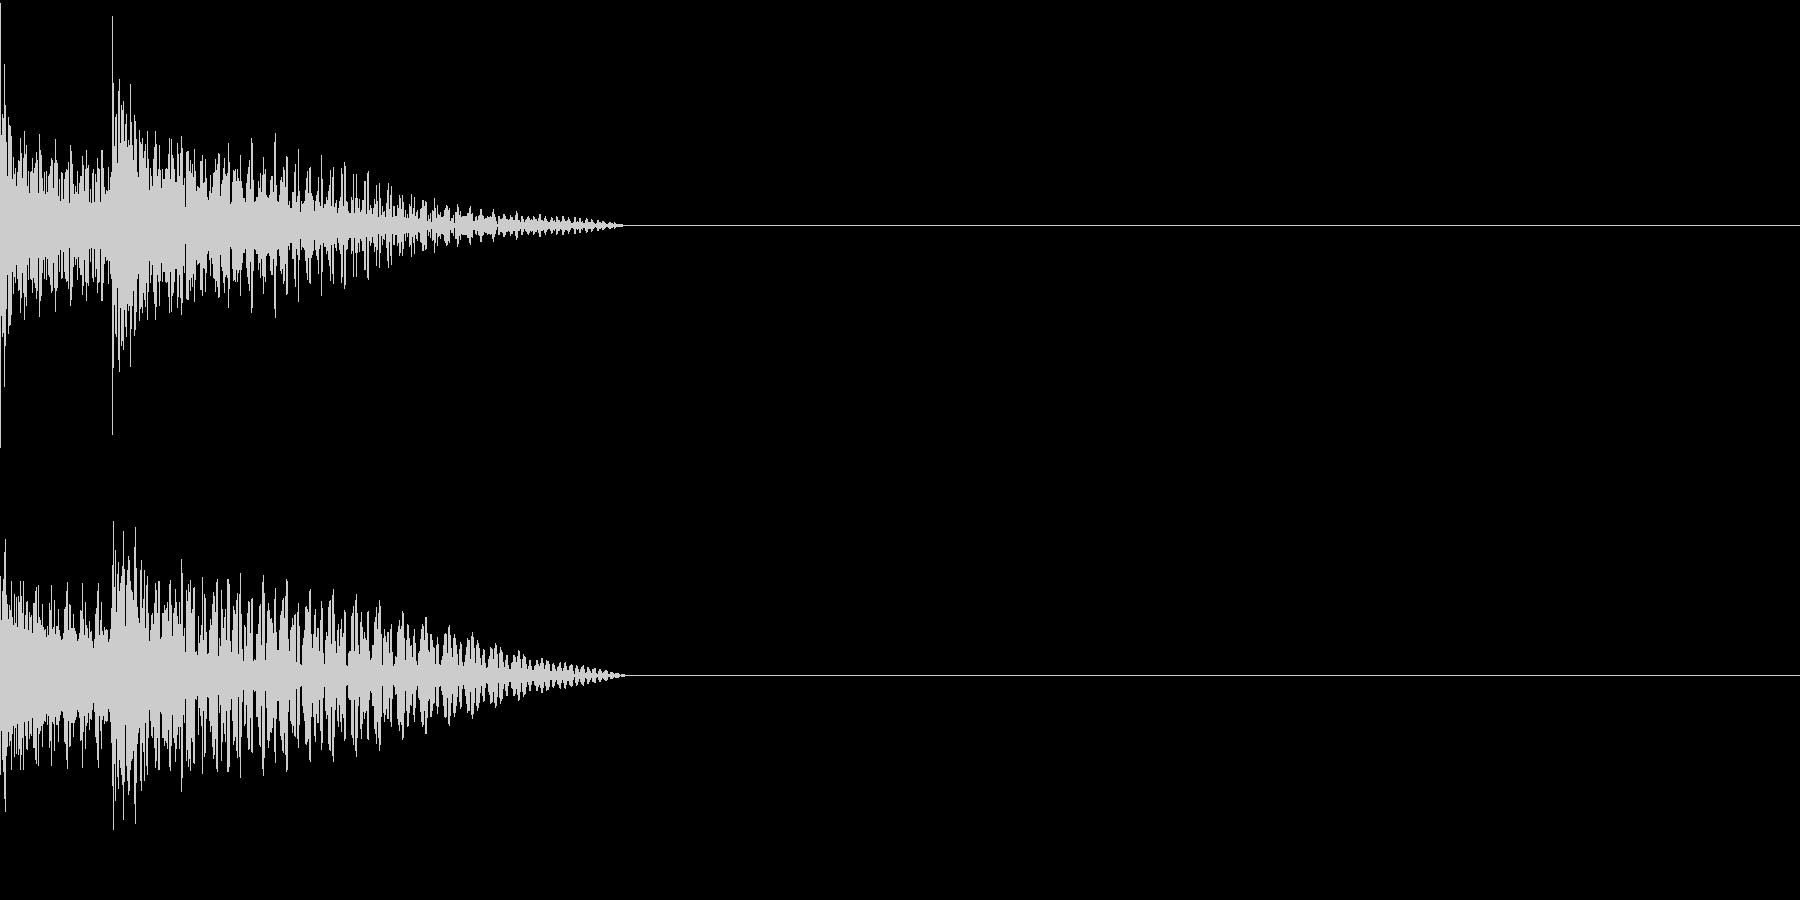 Cursor セレクト・カーソルの音7の未再生の波形